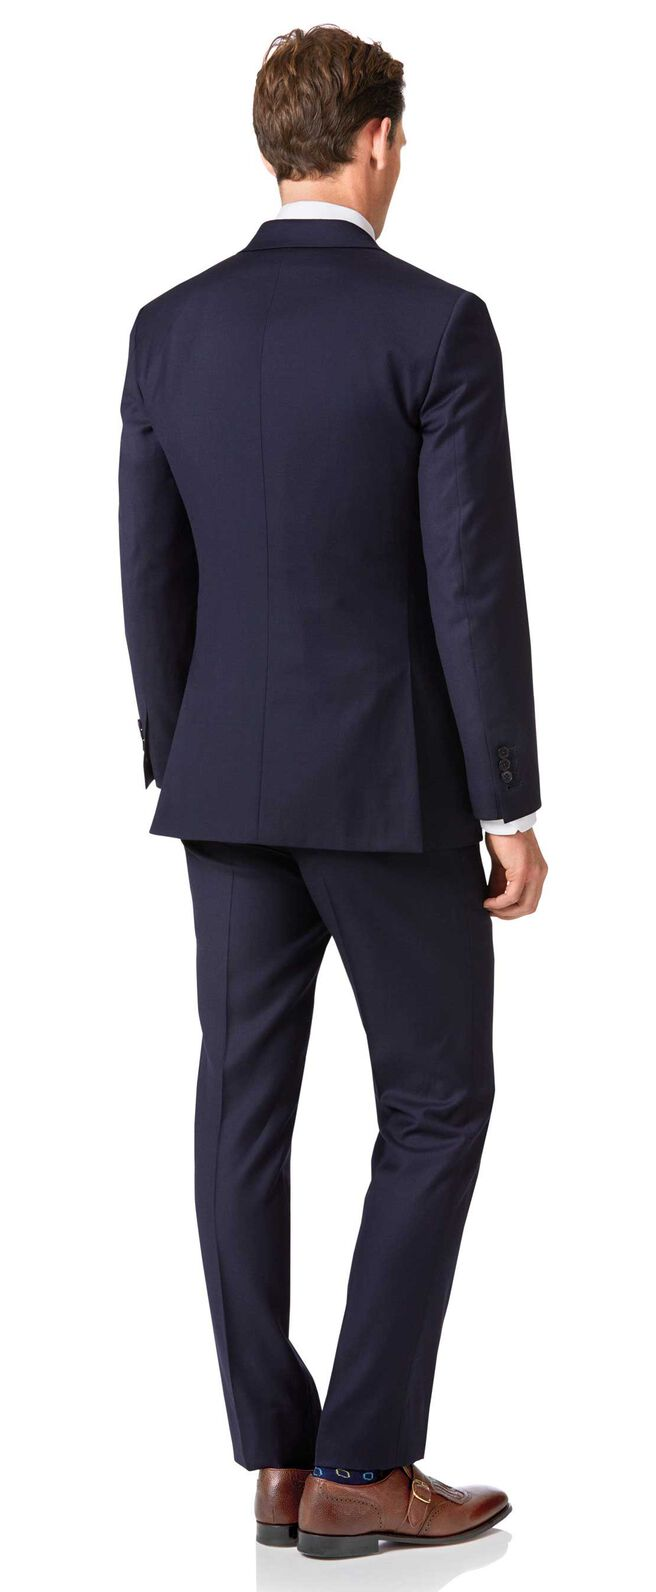 hot sale online 79706 25578 Slim Fit Business Twill-Anzug in Marineblau | Charles Tyrwhitt